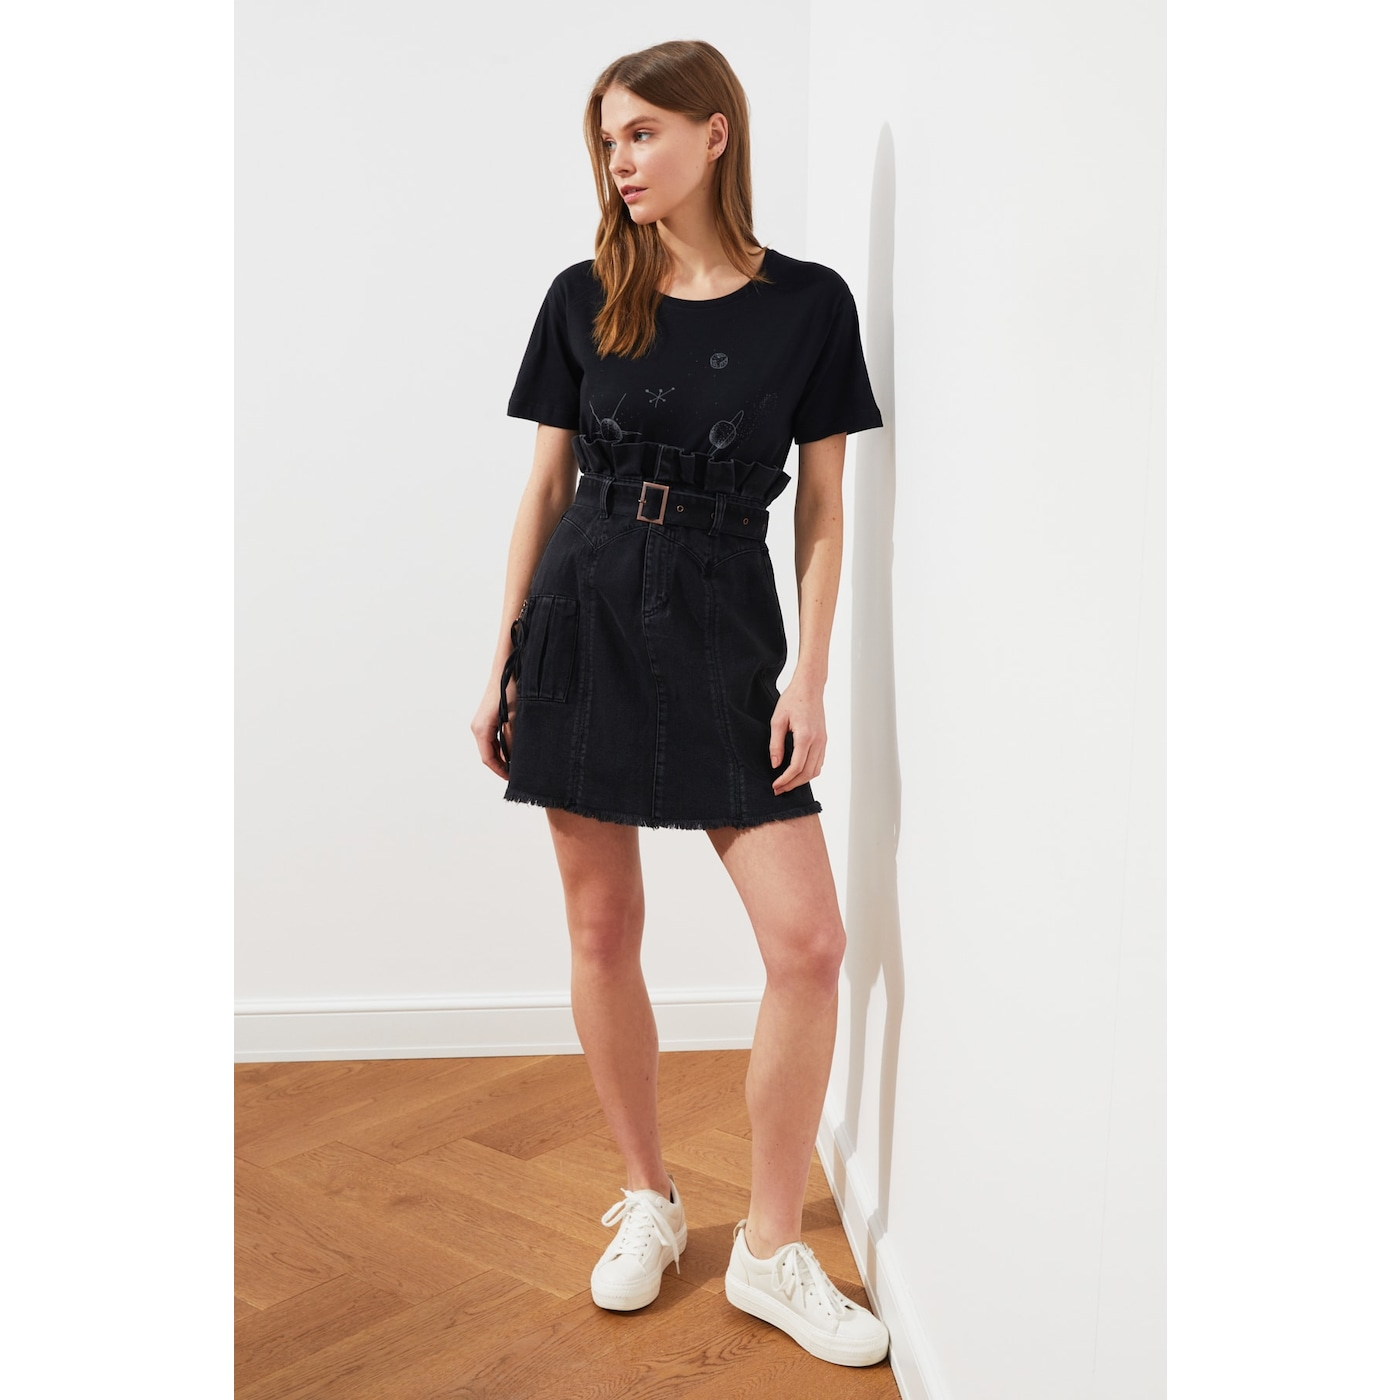 Trendyol Anthracite Waist Ruffled Belt Mini Denim Skirt dámské 36